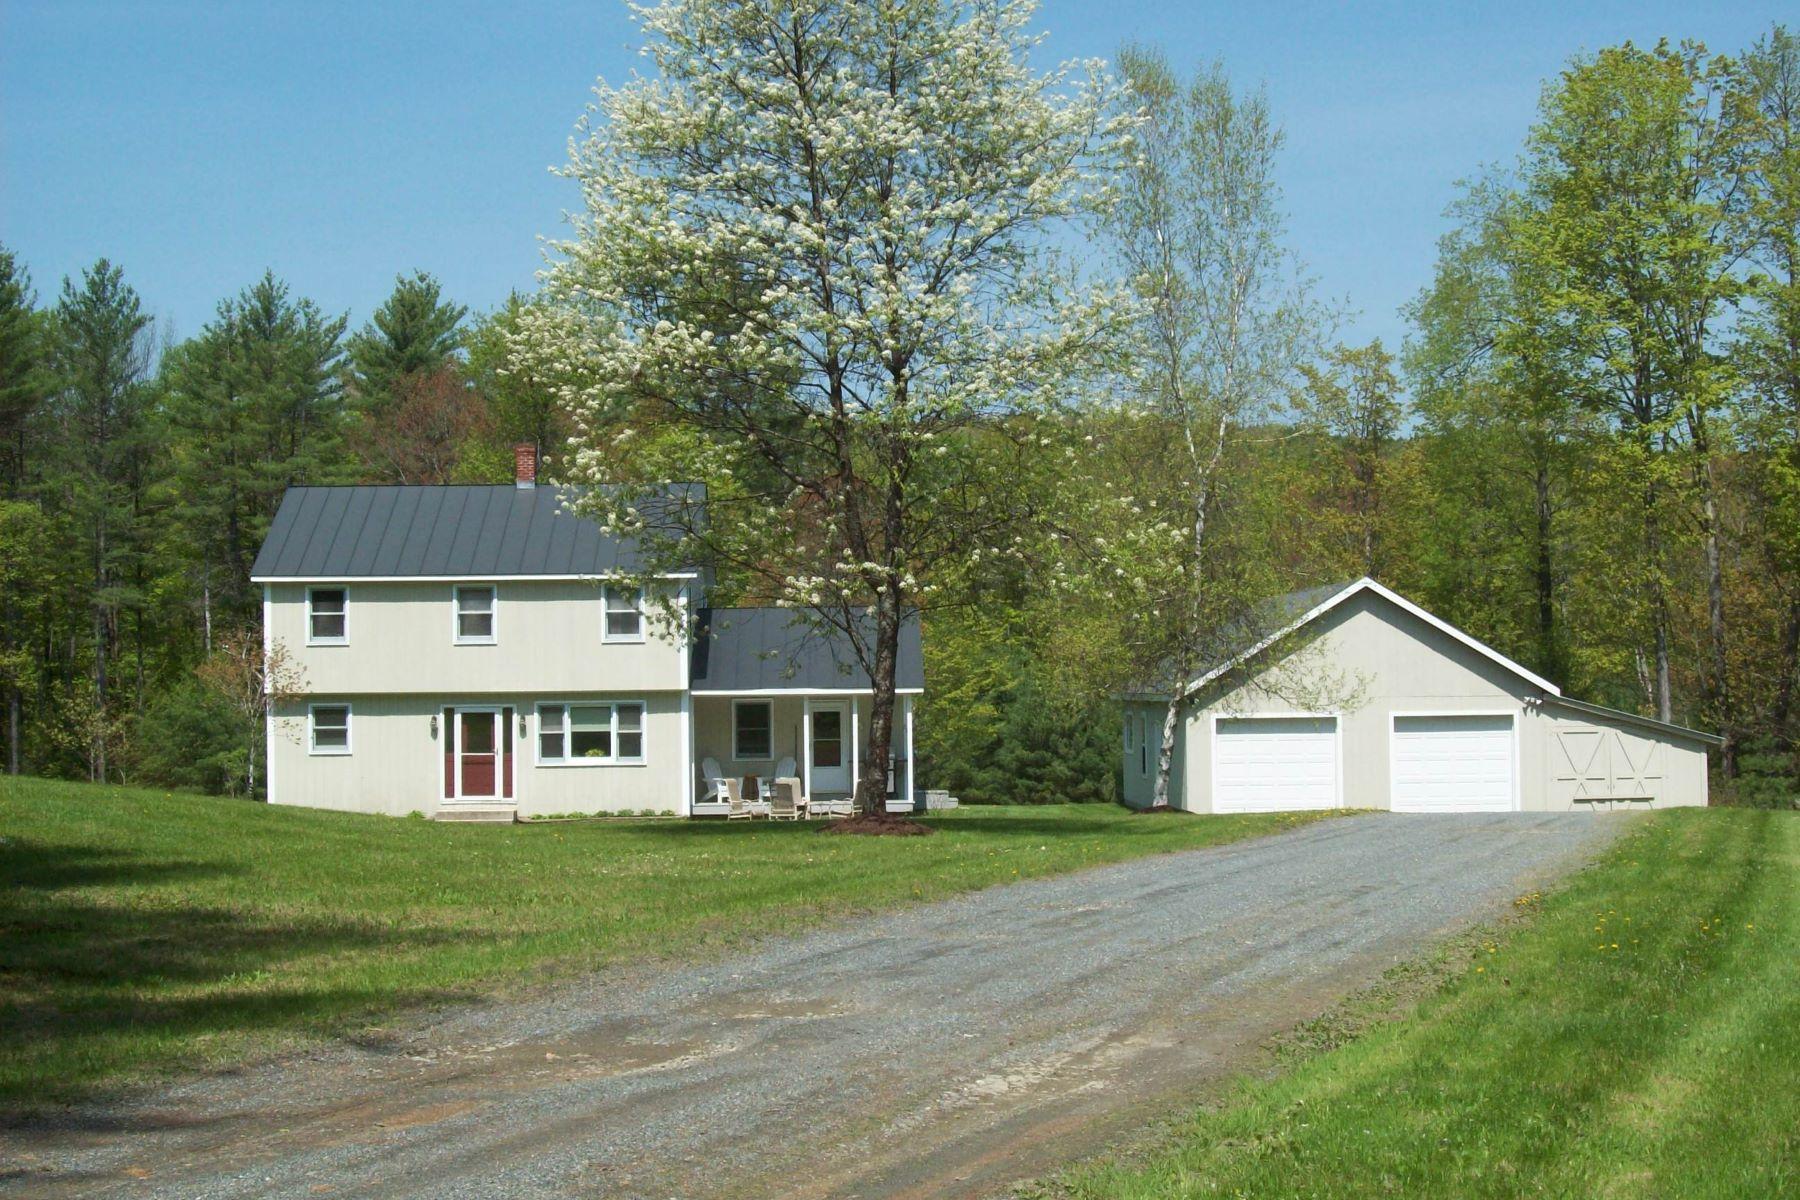 Single Family Home for Sale at 296 Burnham Road, Thetford 296 Burnham Rd Thetford, Vermont 05074 United States